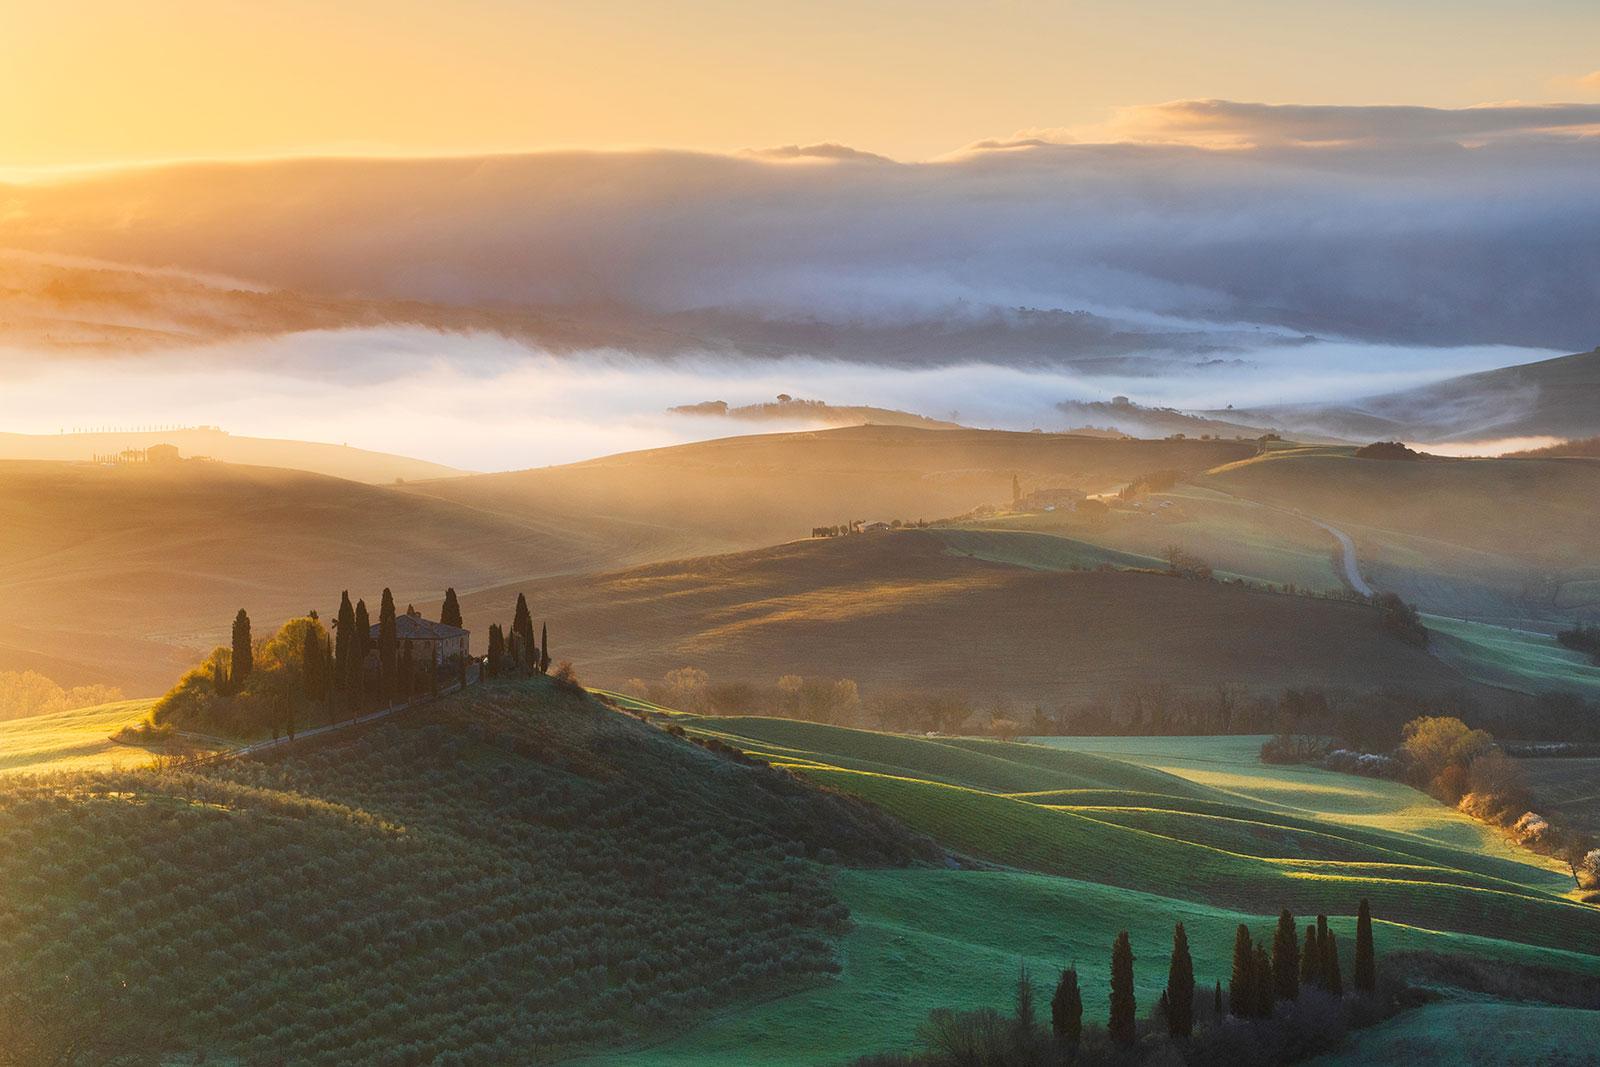 Giuseppe Terranova fotografia paesaggio